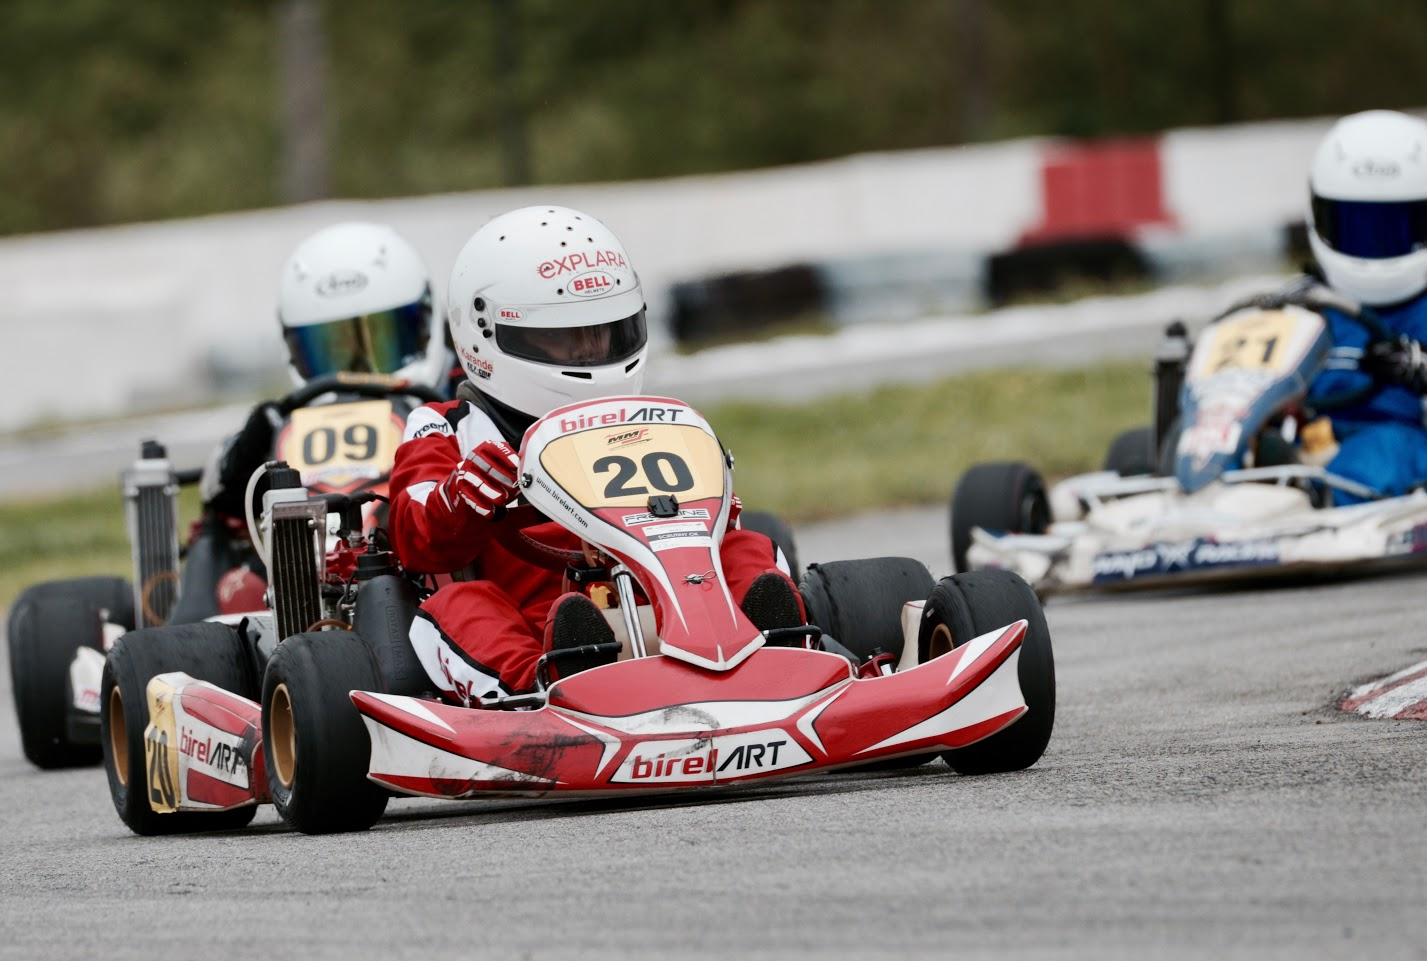 Racer Aadi Rotax Karting Birel Art